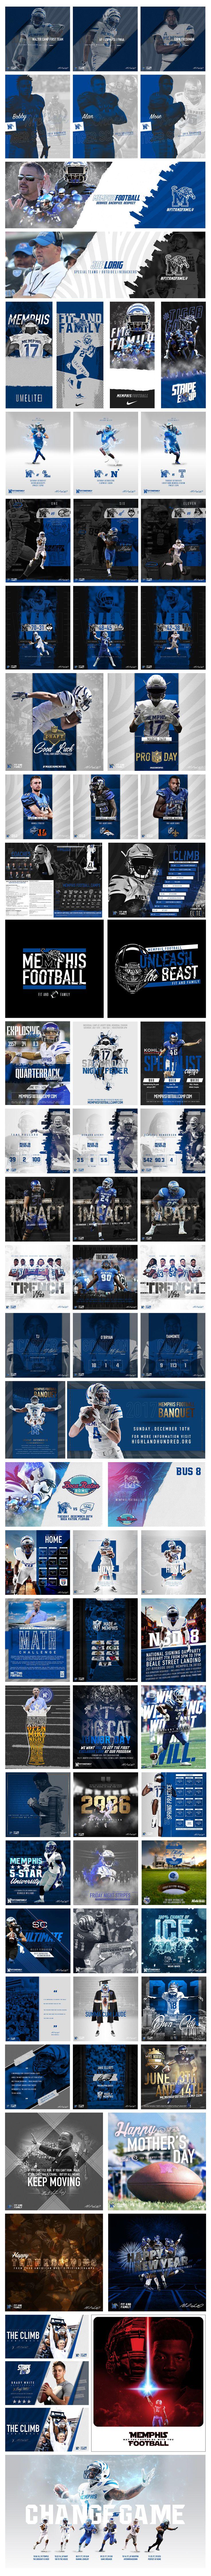 2017 Memphis Football